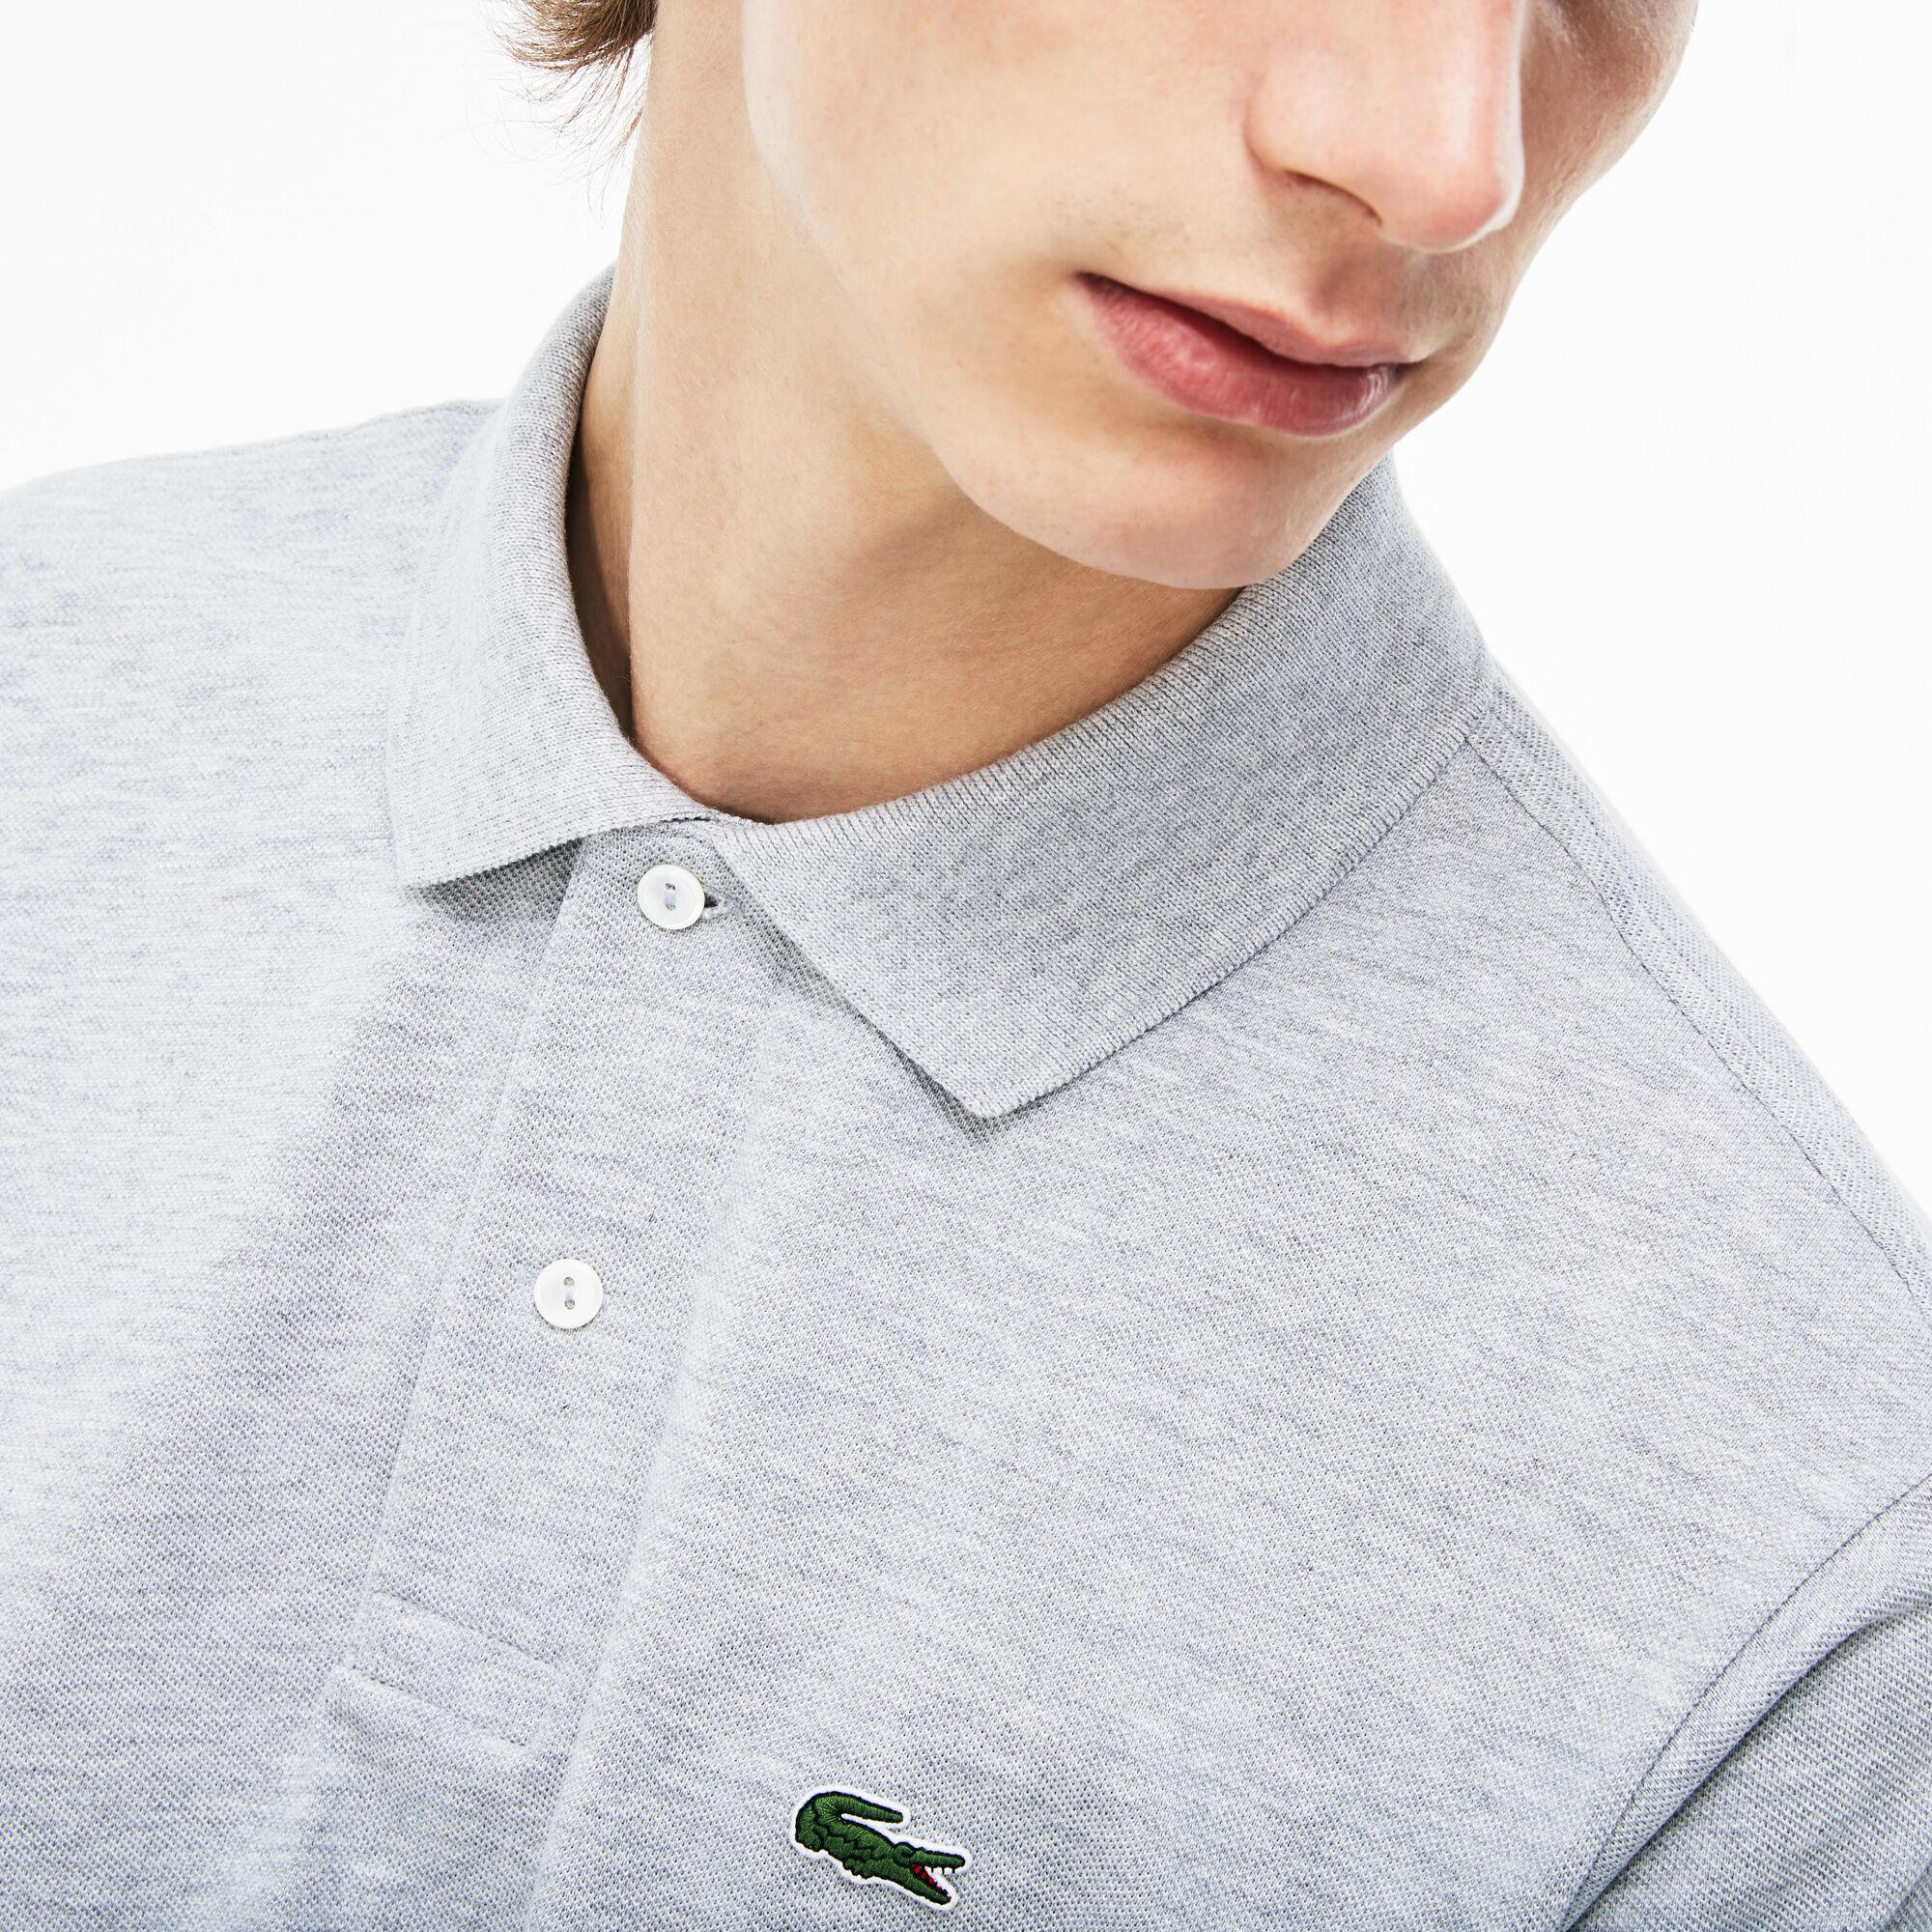 Marl Lacoste L.12.12 Polo Shirt